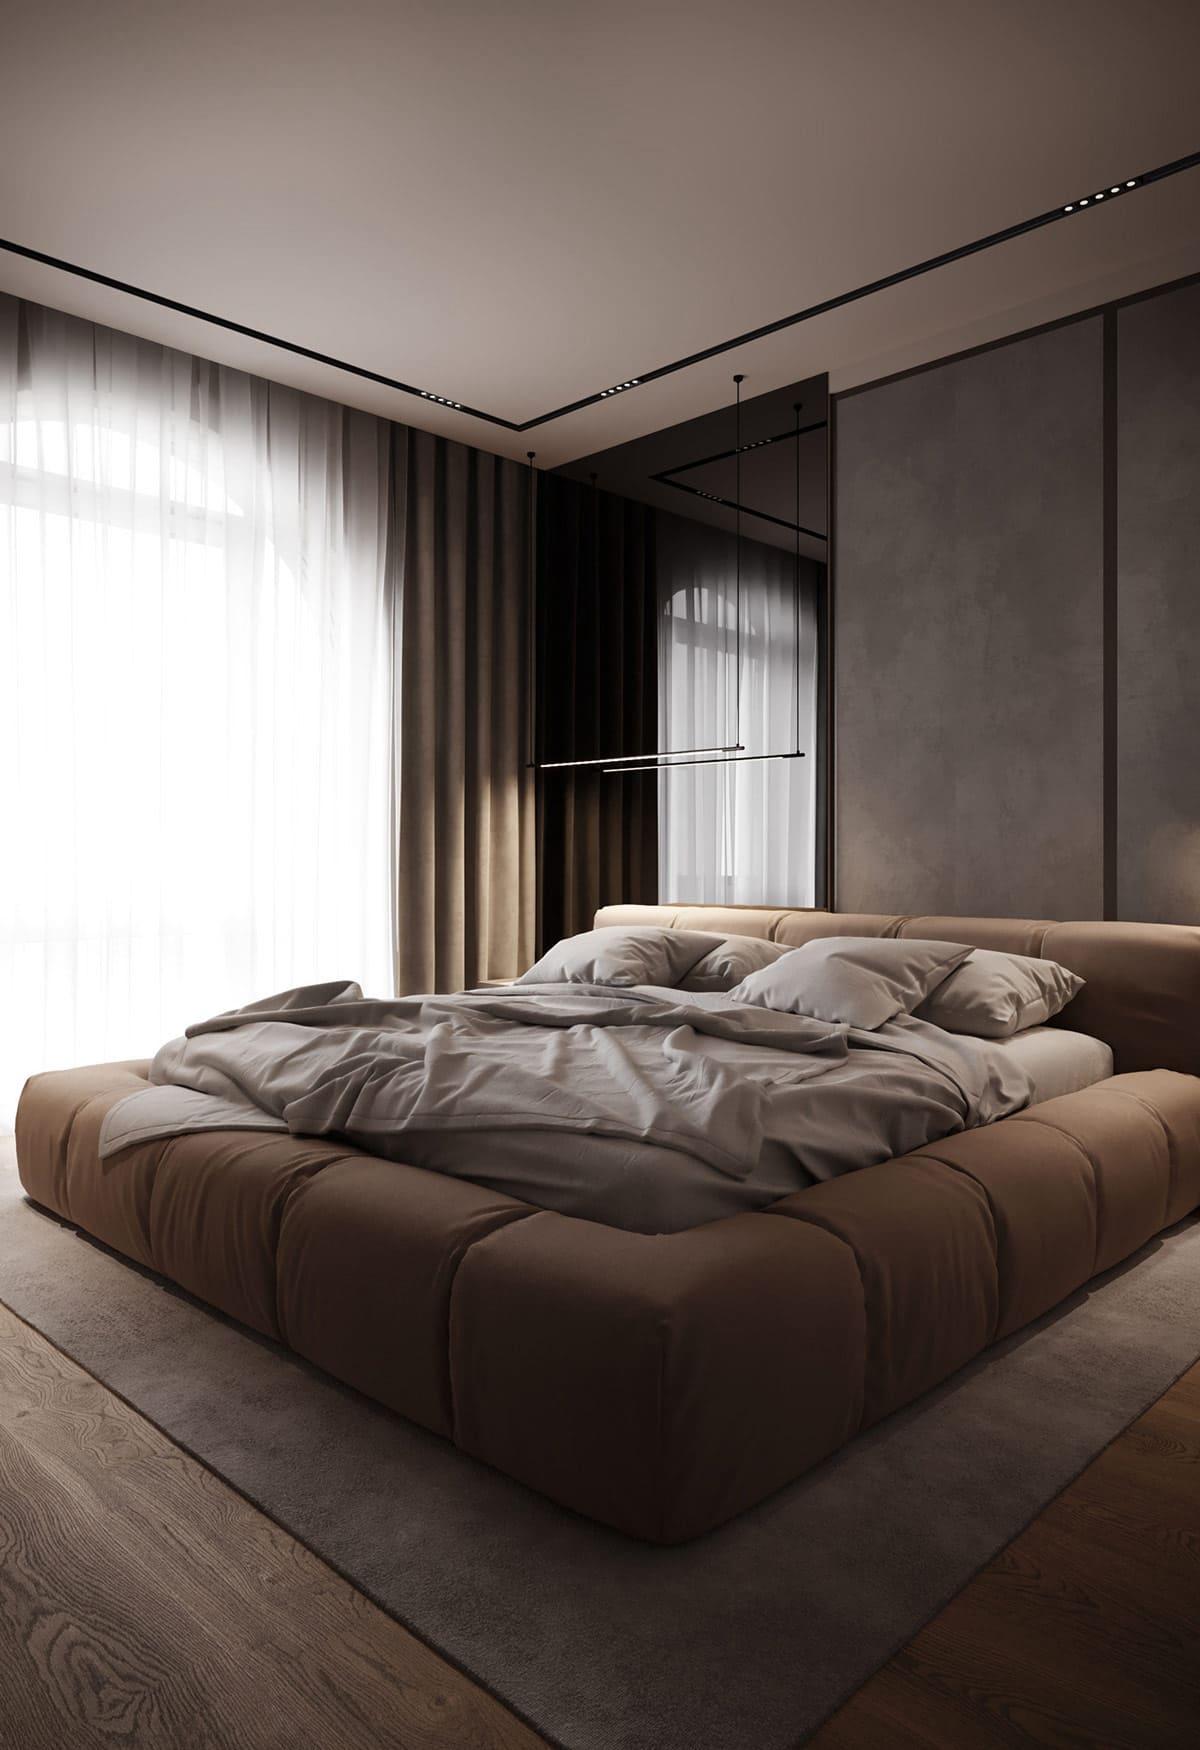 дизайн интерьера модной квартиры фото 5